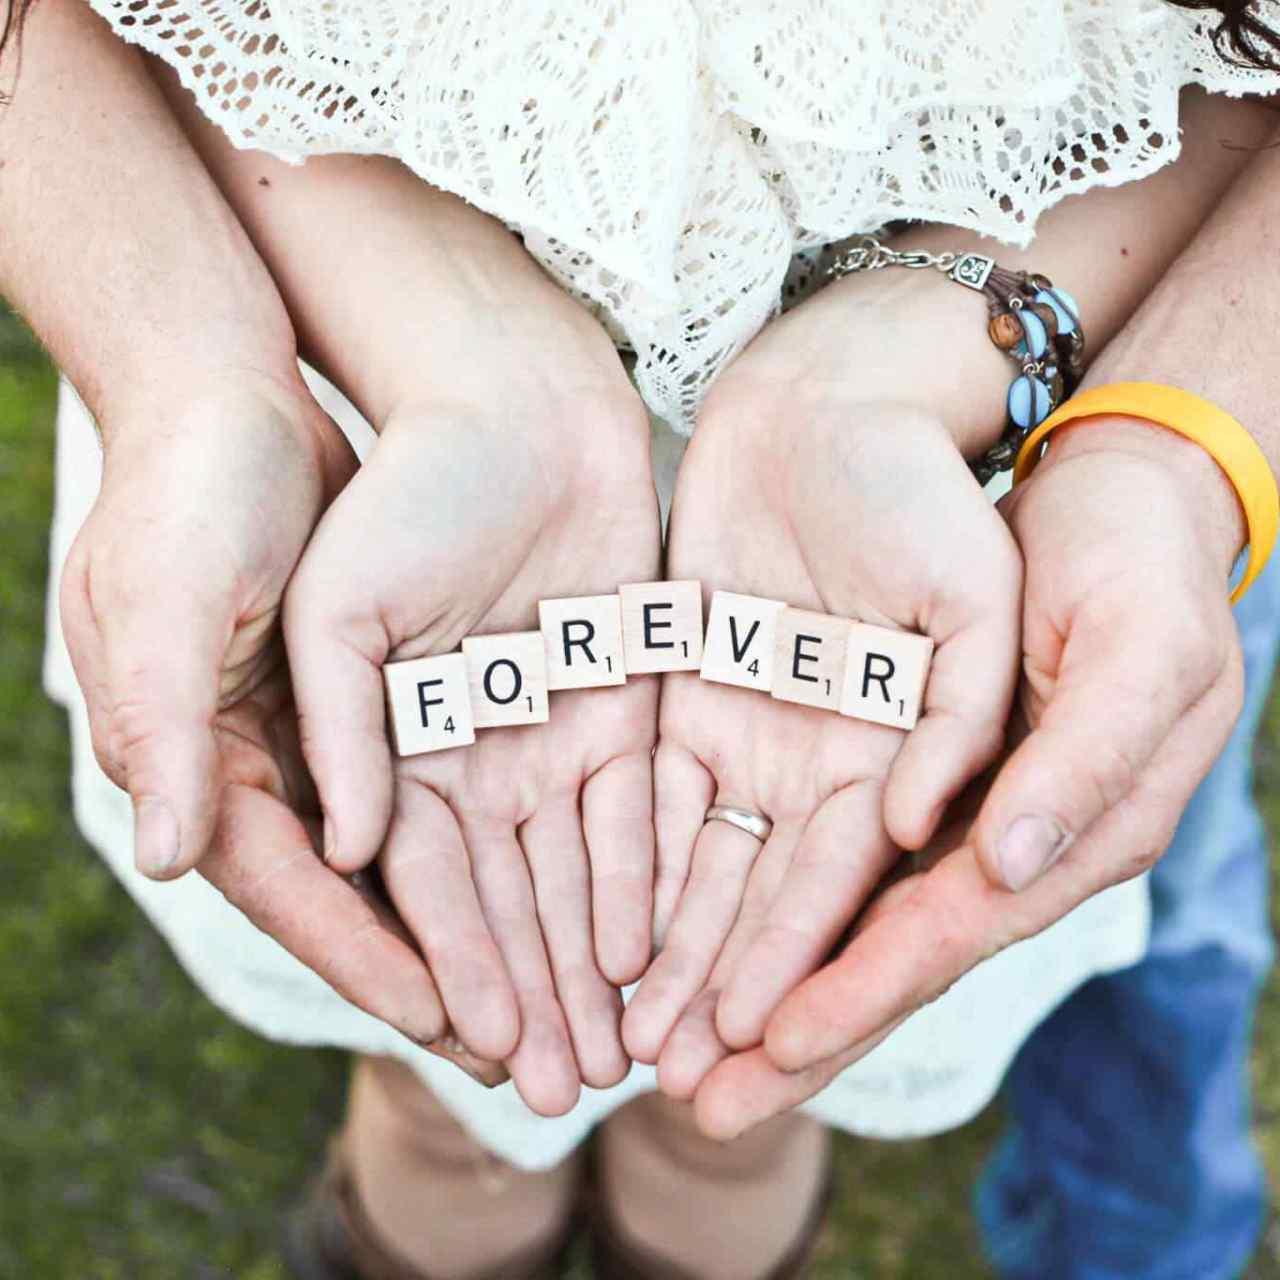 https://i1.wp.com/truhap.com/wp-content/uploads/2018/01/img-event-marriage-03.jpg?resize=1280%2C1280&ssl=1